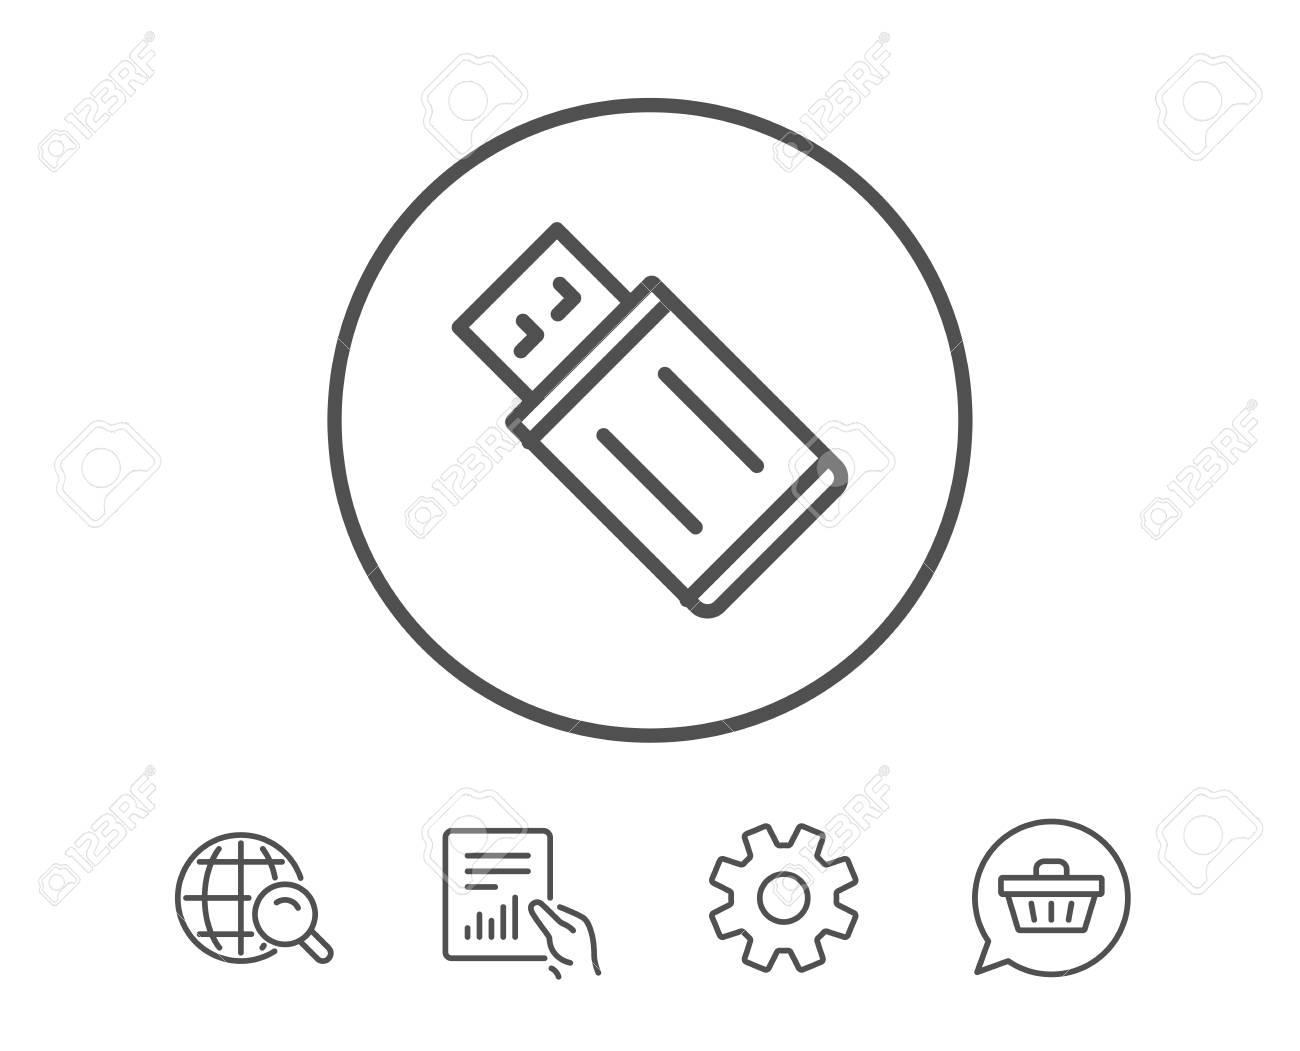 USB flash drive line icon  Memory stick sign  Portable data storage